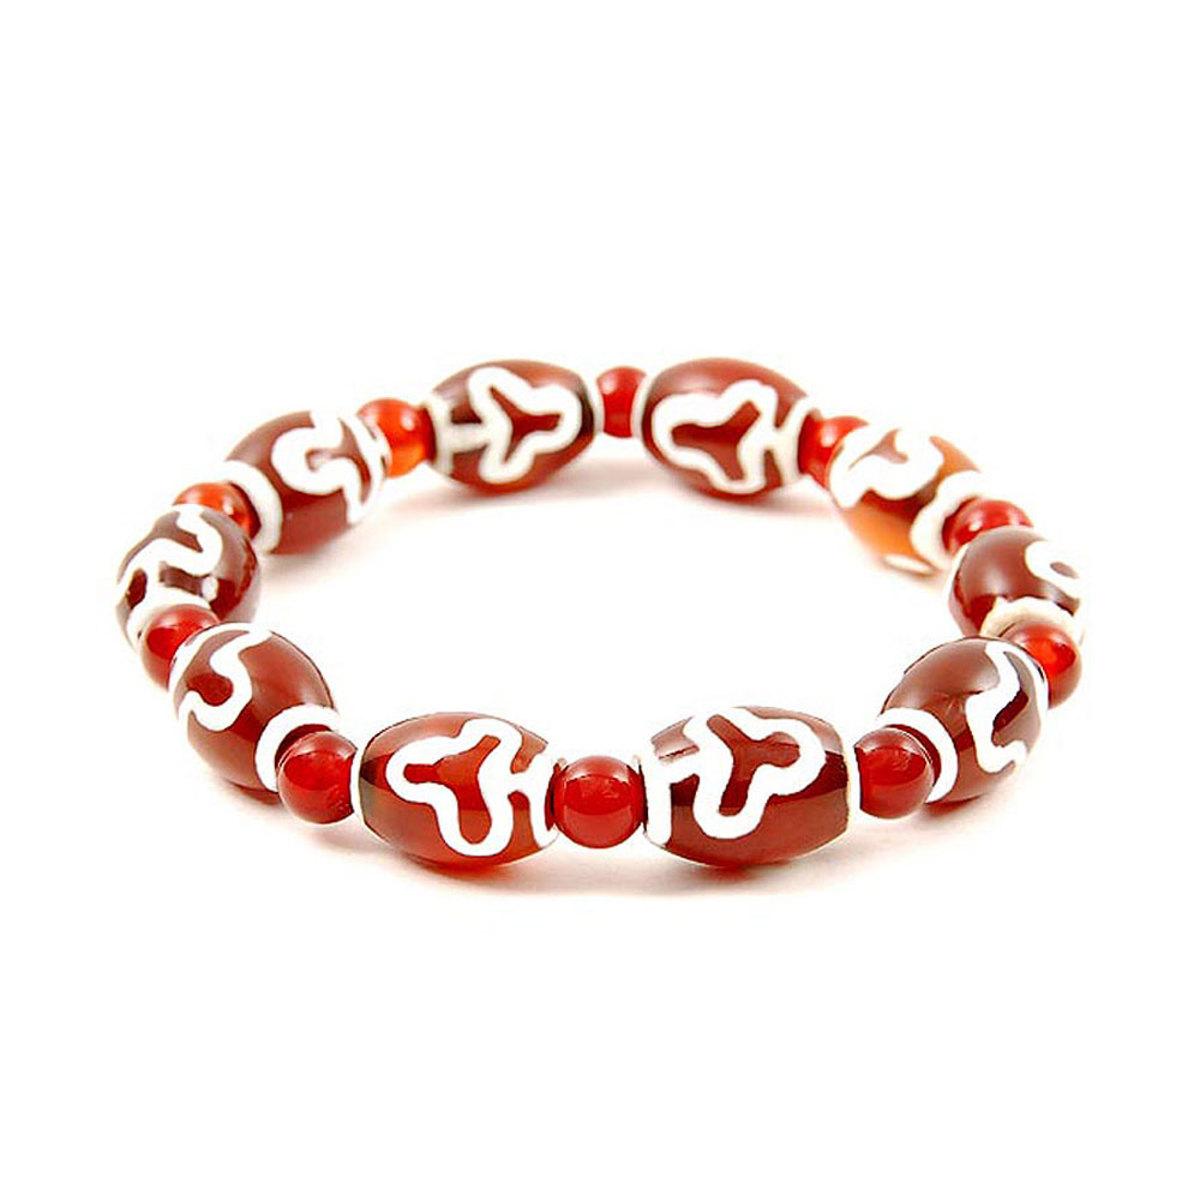 Lucky Dzi Bead Bracelet (10x14mm) - Bodhi